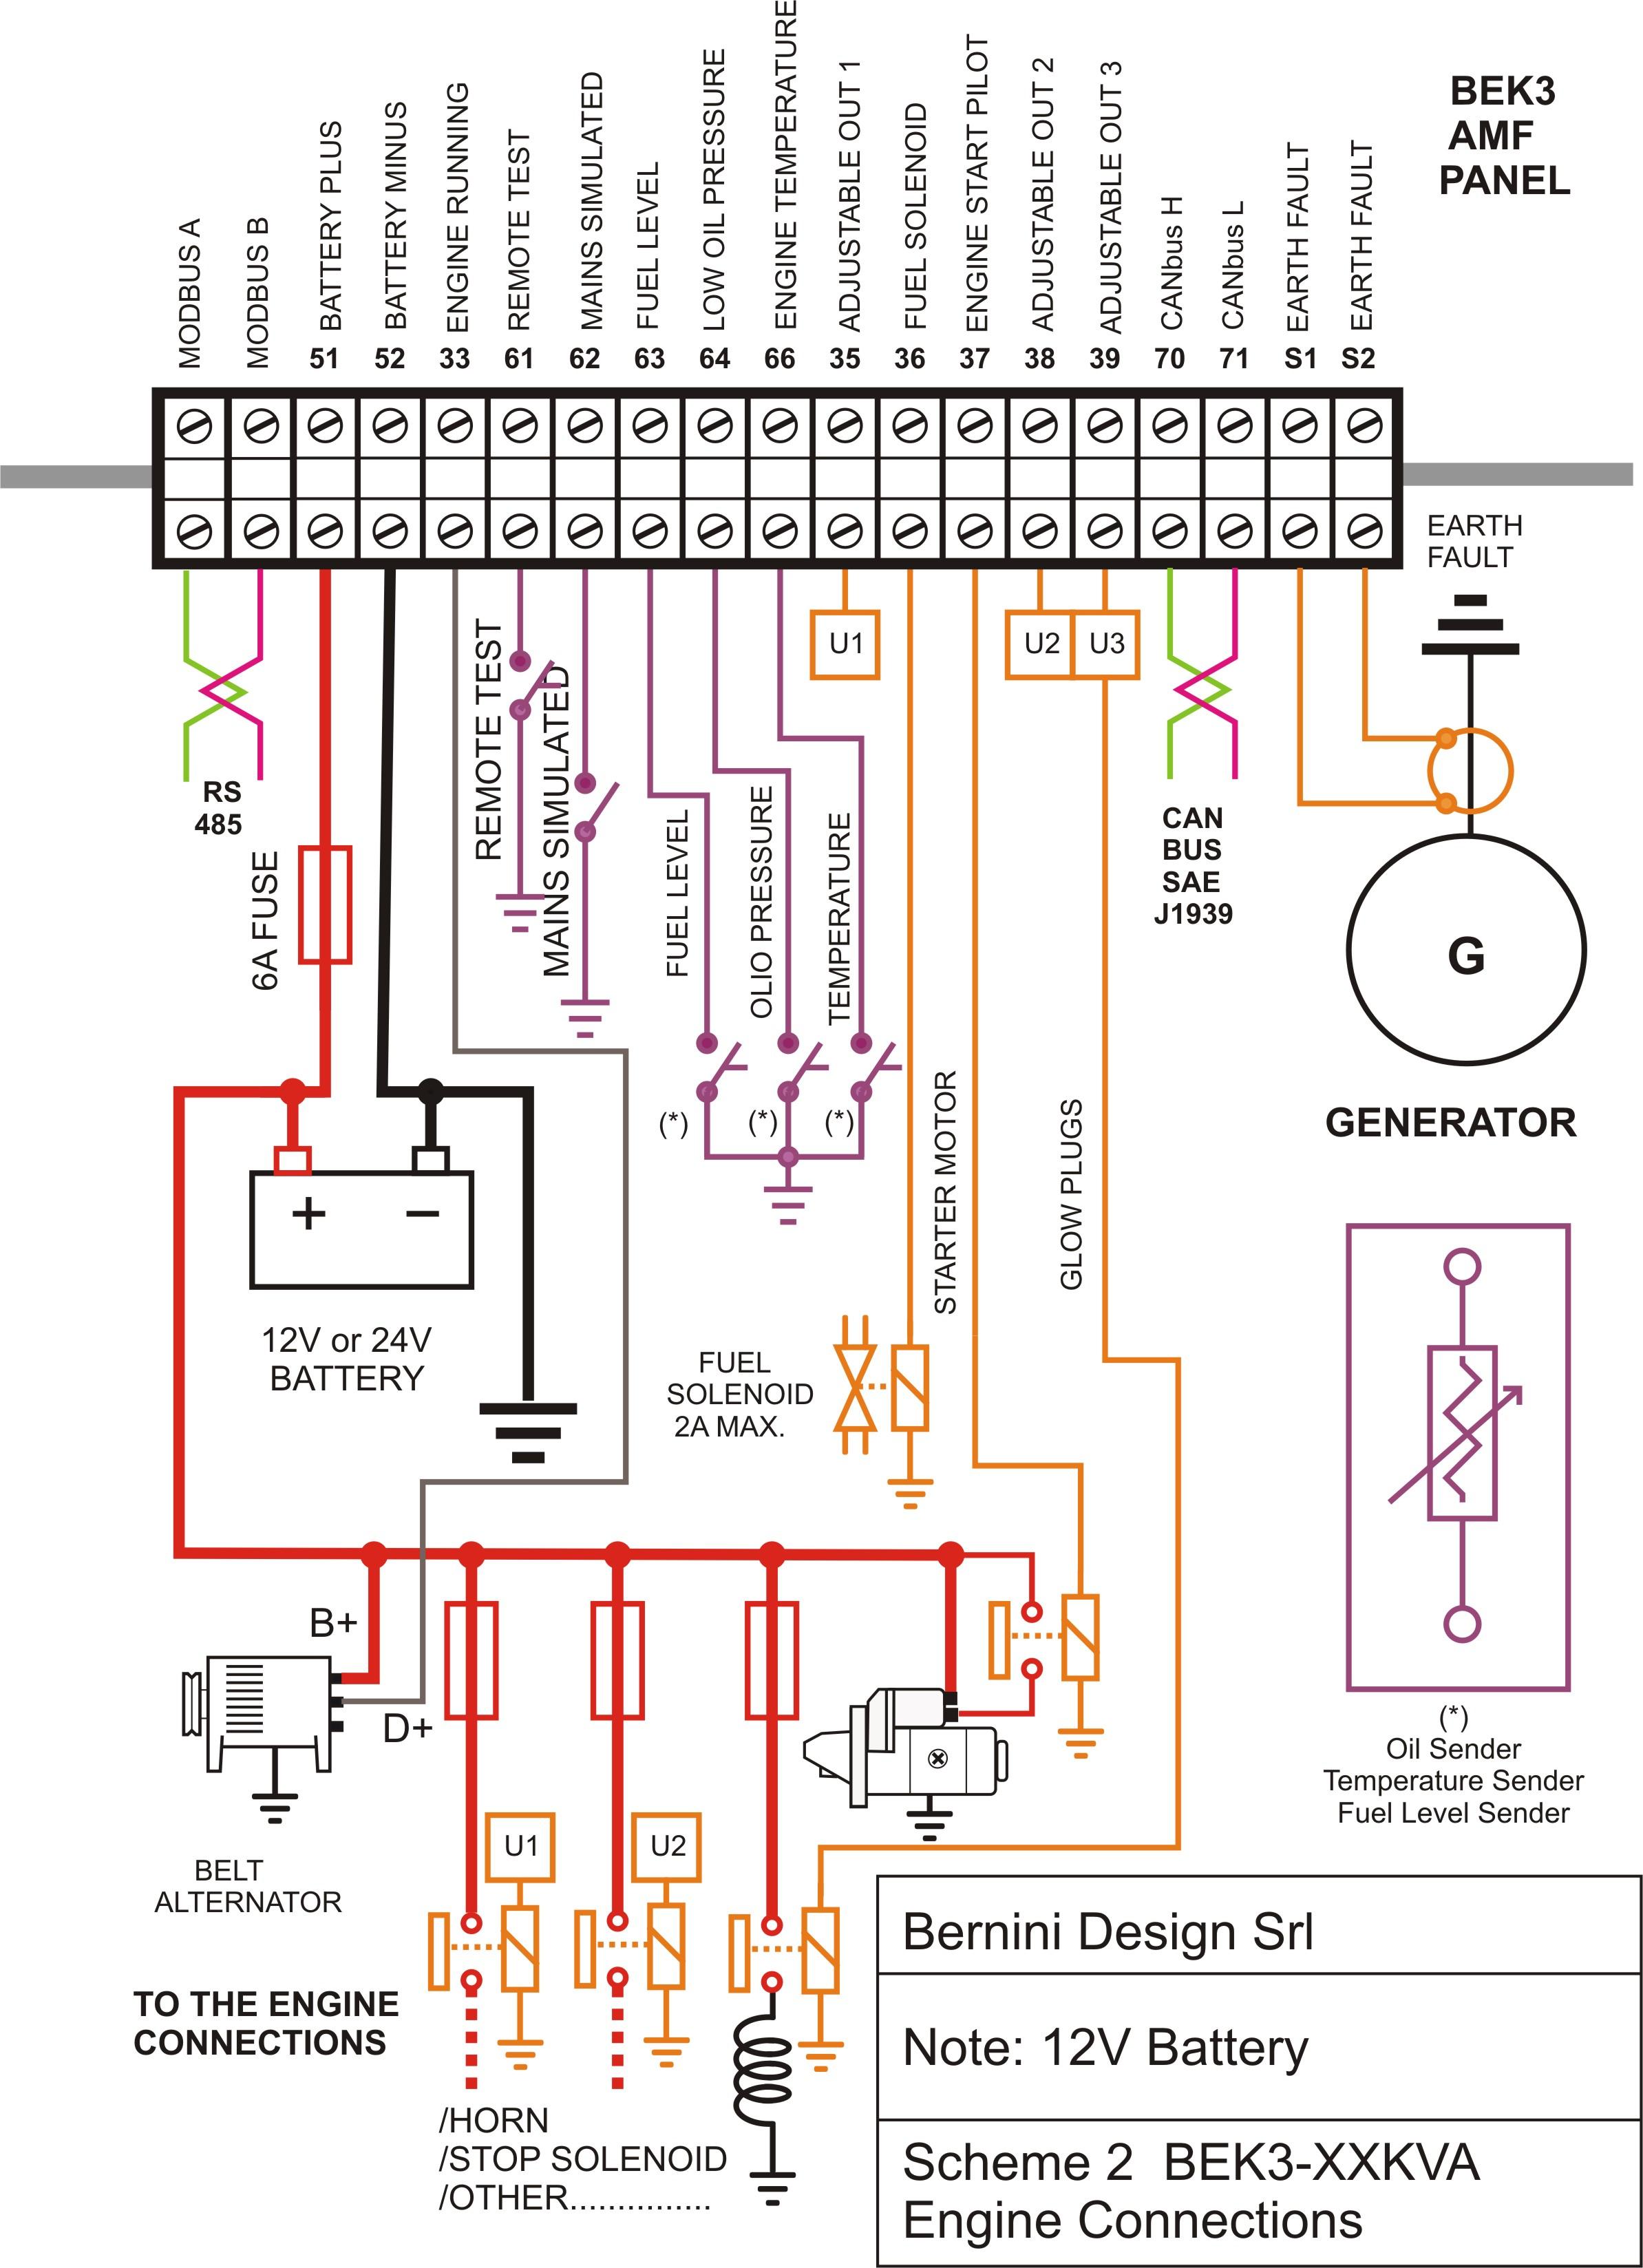 Plc Panel Wiring Diagram Pdf   Manual E-Books - Simple Wiring Diagram